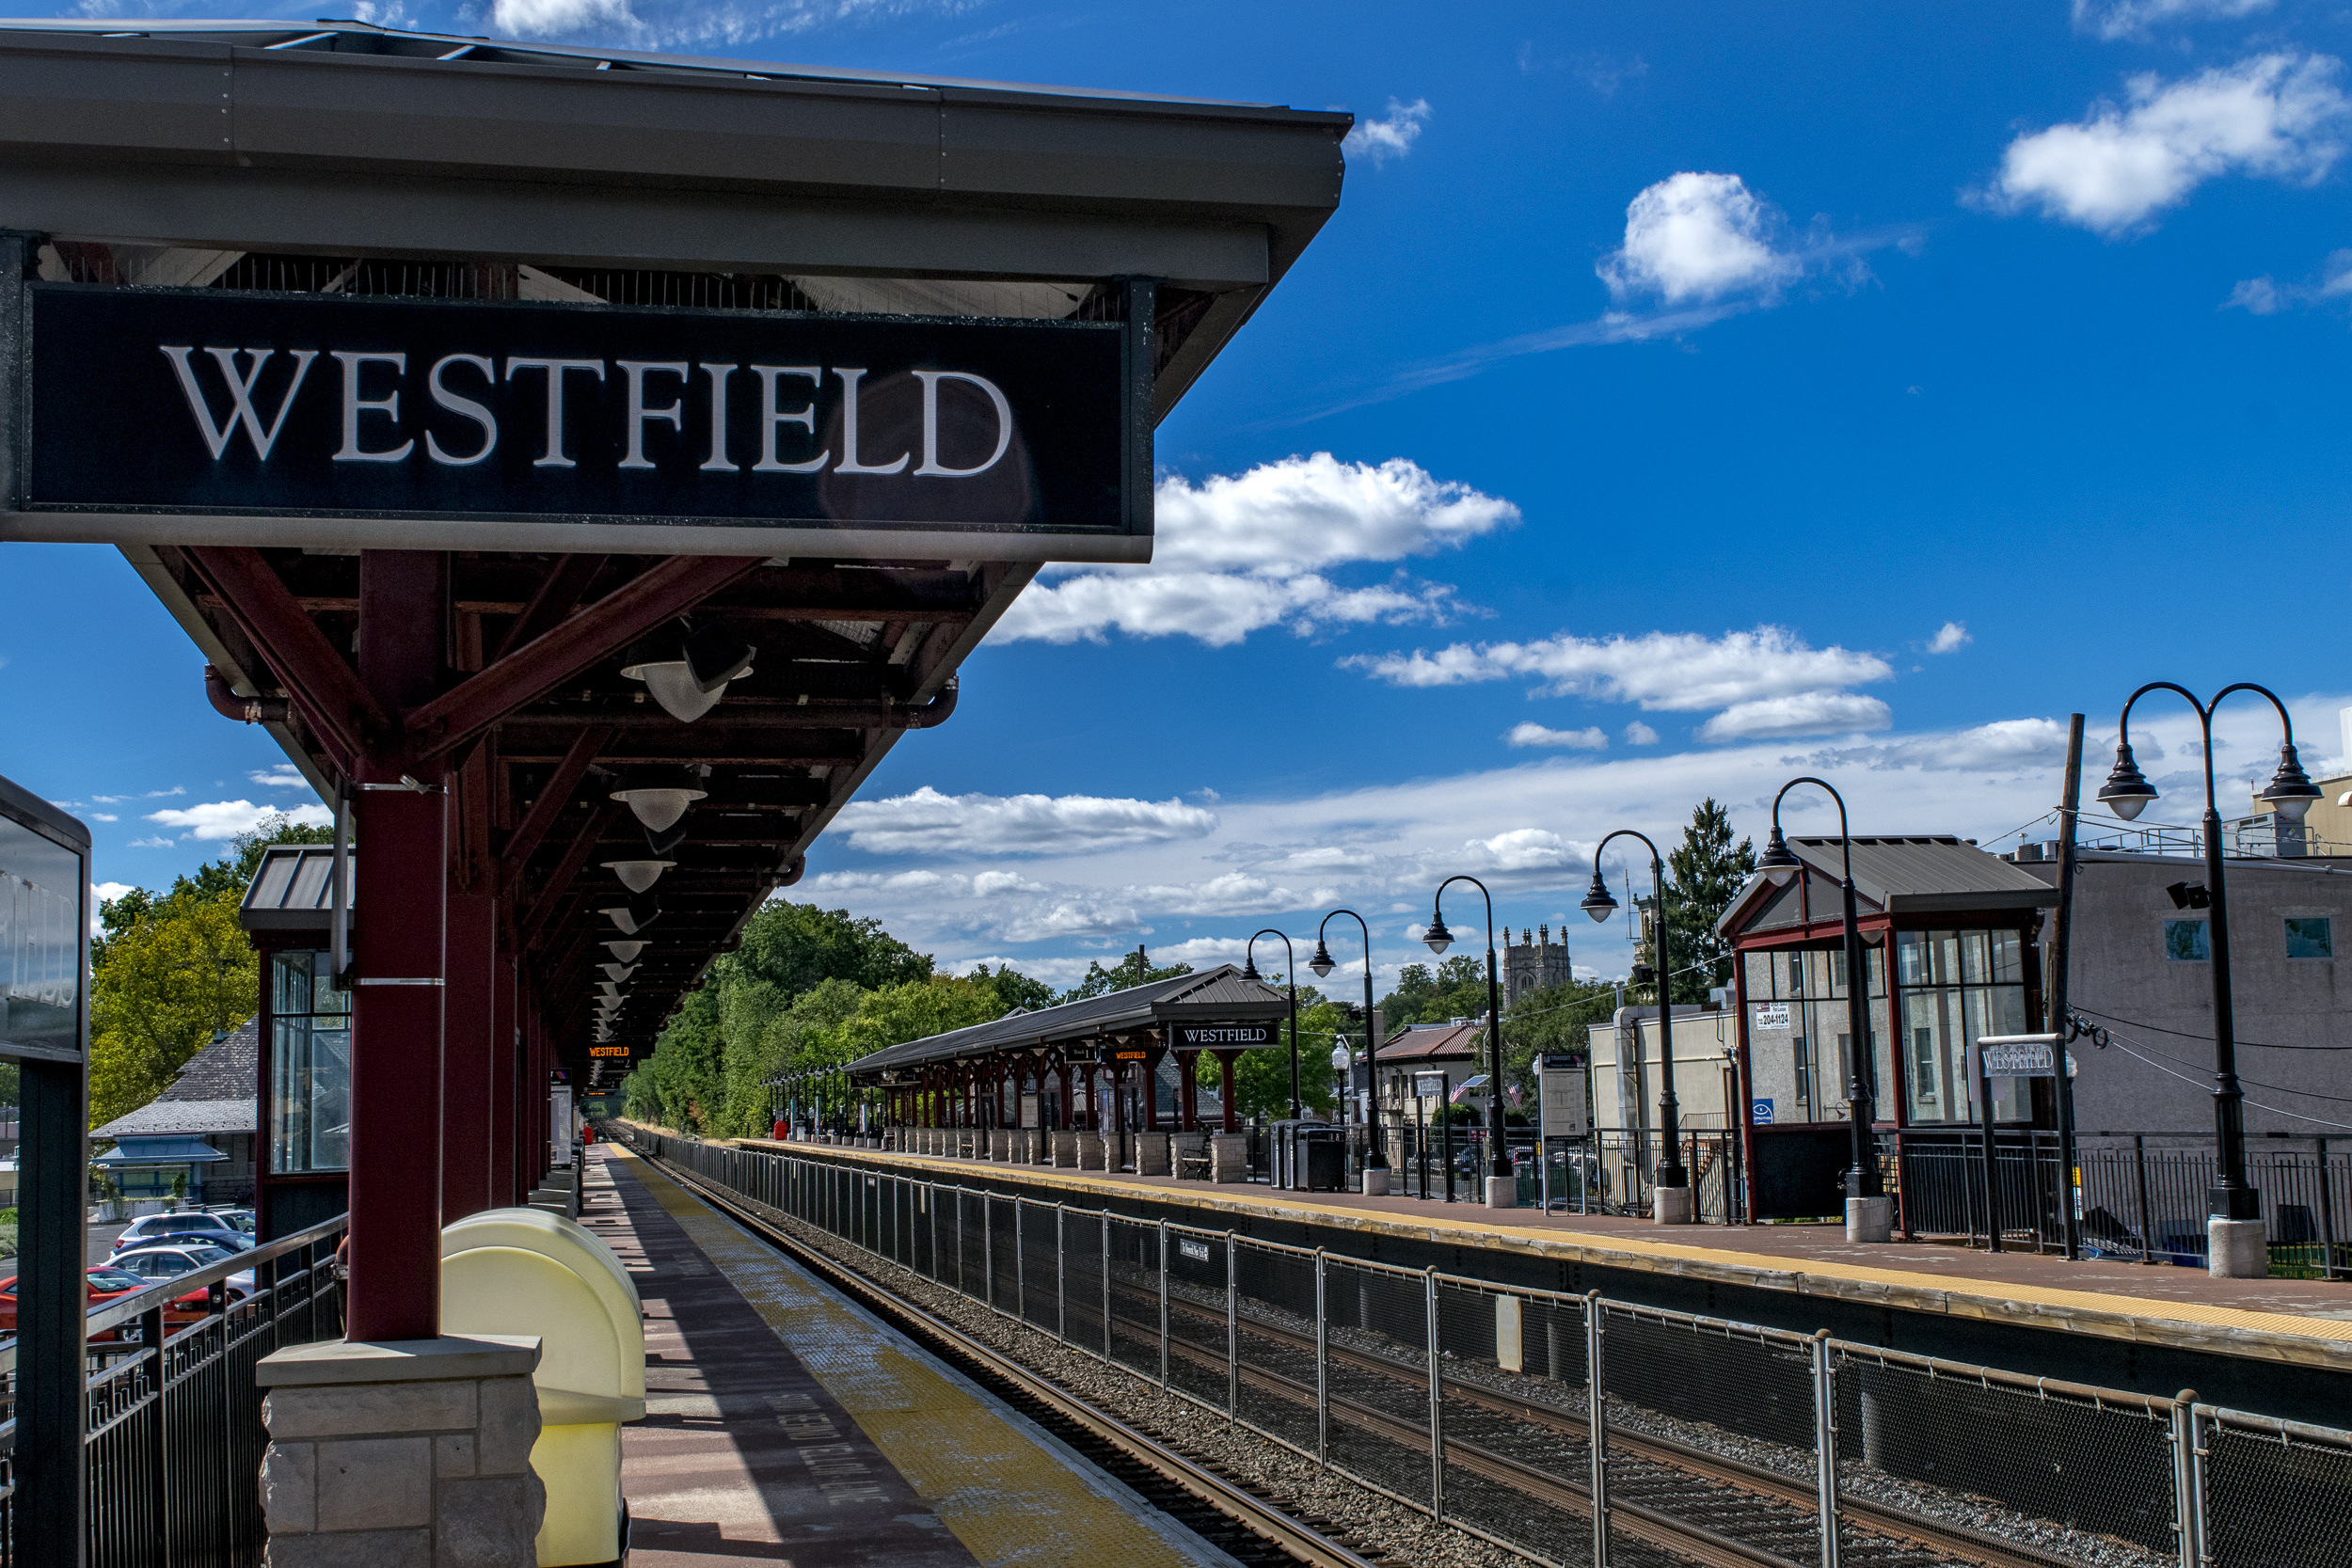 Westfield-Train-Station-2.jpg